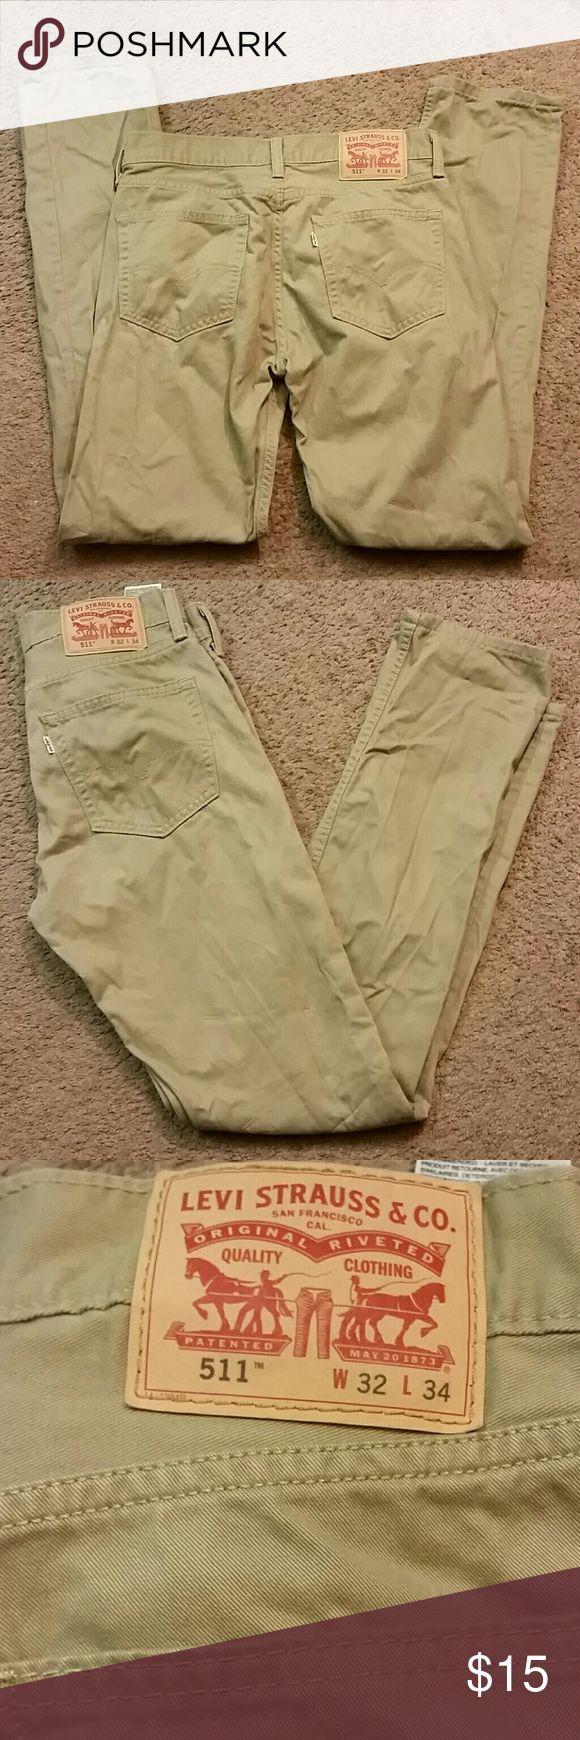 Mens Levi Strauss & Co 511 Pants 511 Skinny fitting mens tan color pants. A good buy. Levi's Pants